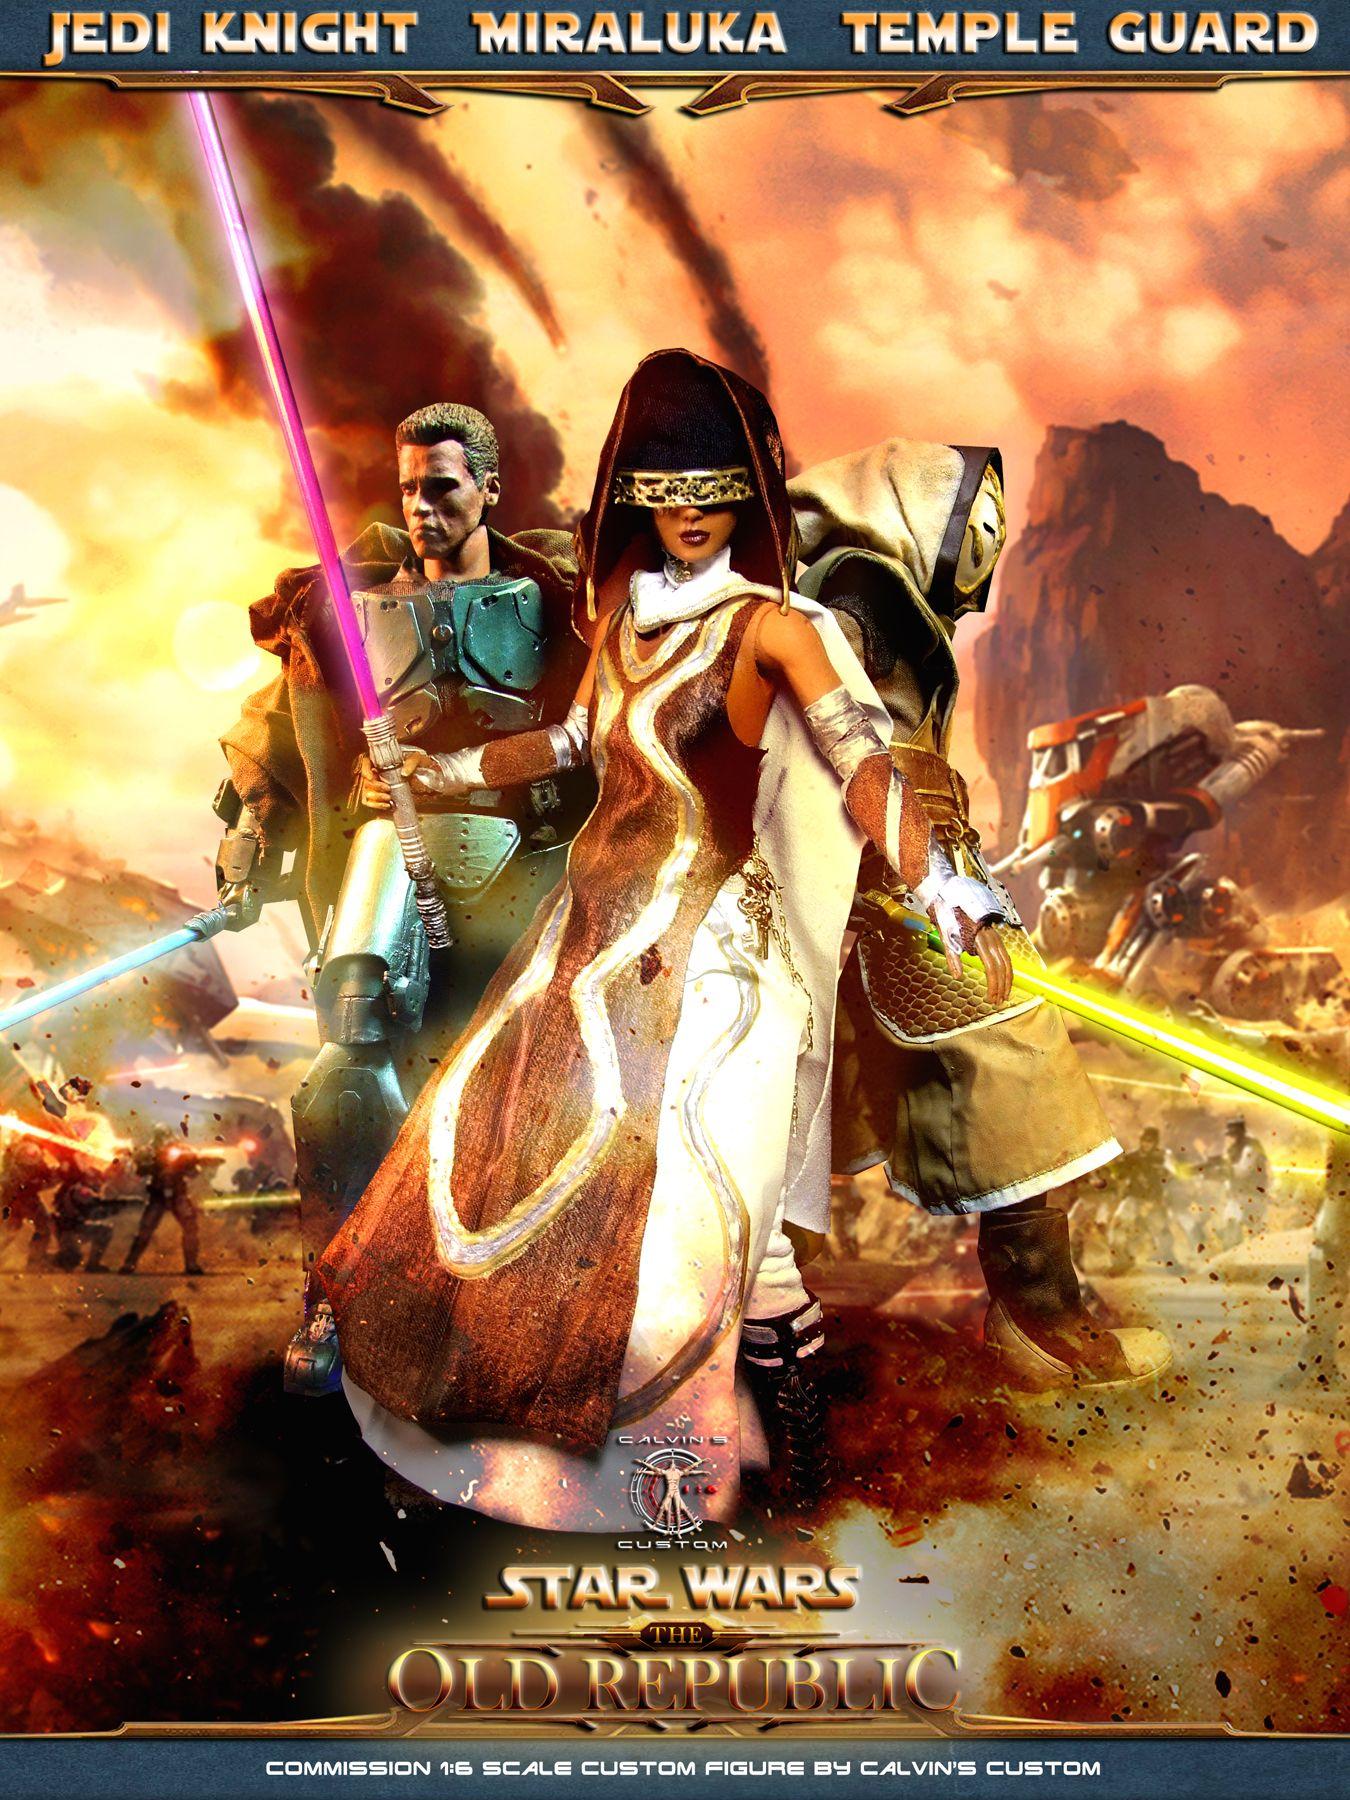 Star Wars Old Republic Timeline : republic, timeline, Calvin's, Custom, Sixth, Scale, SWTOR, Republic:, MIRALUKA,, Knight,, Temple, Guard, Figures